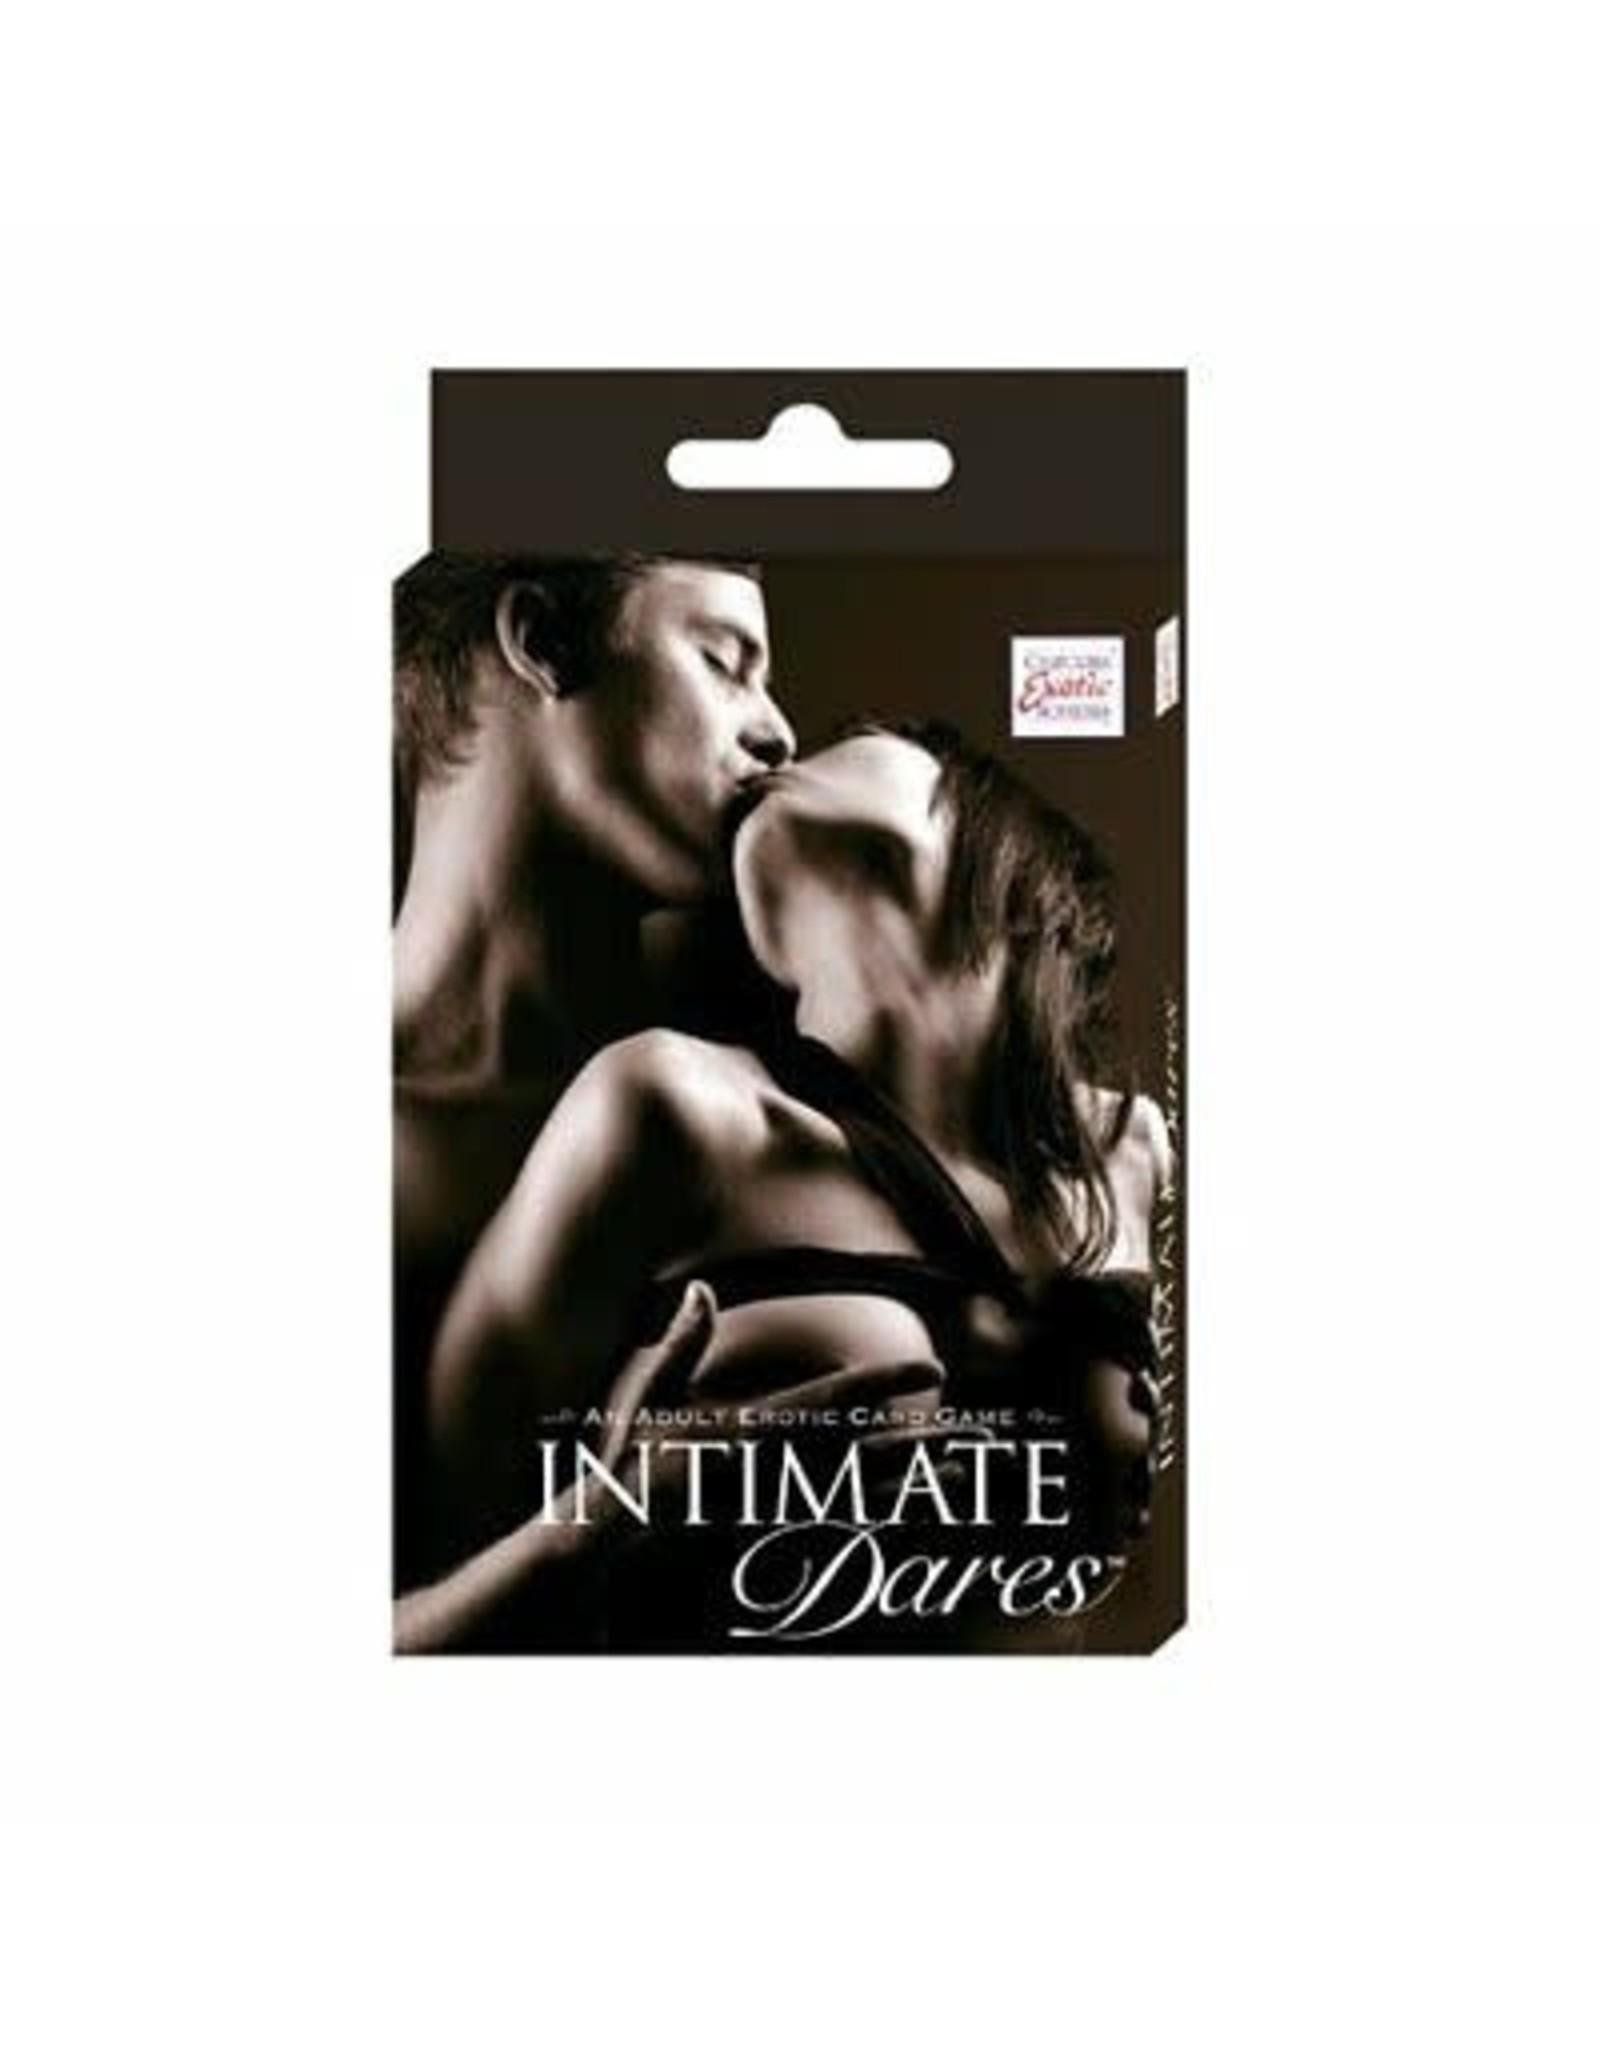 INTIMATE DARES CARD GAME